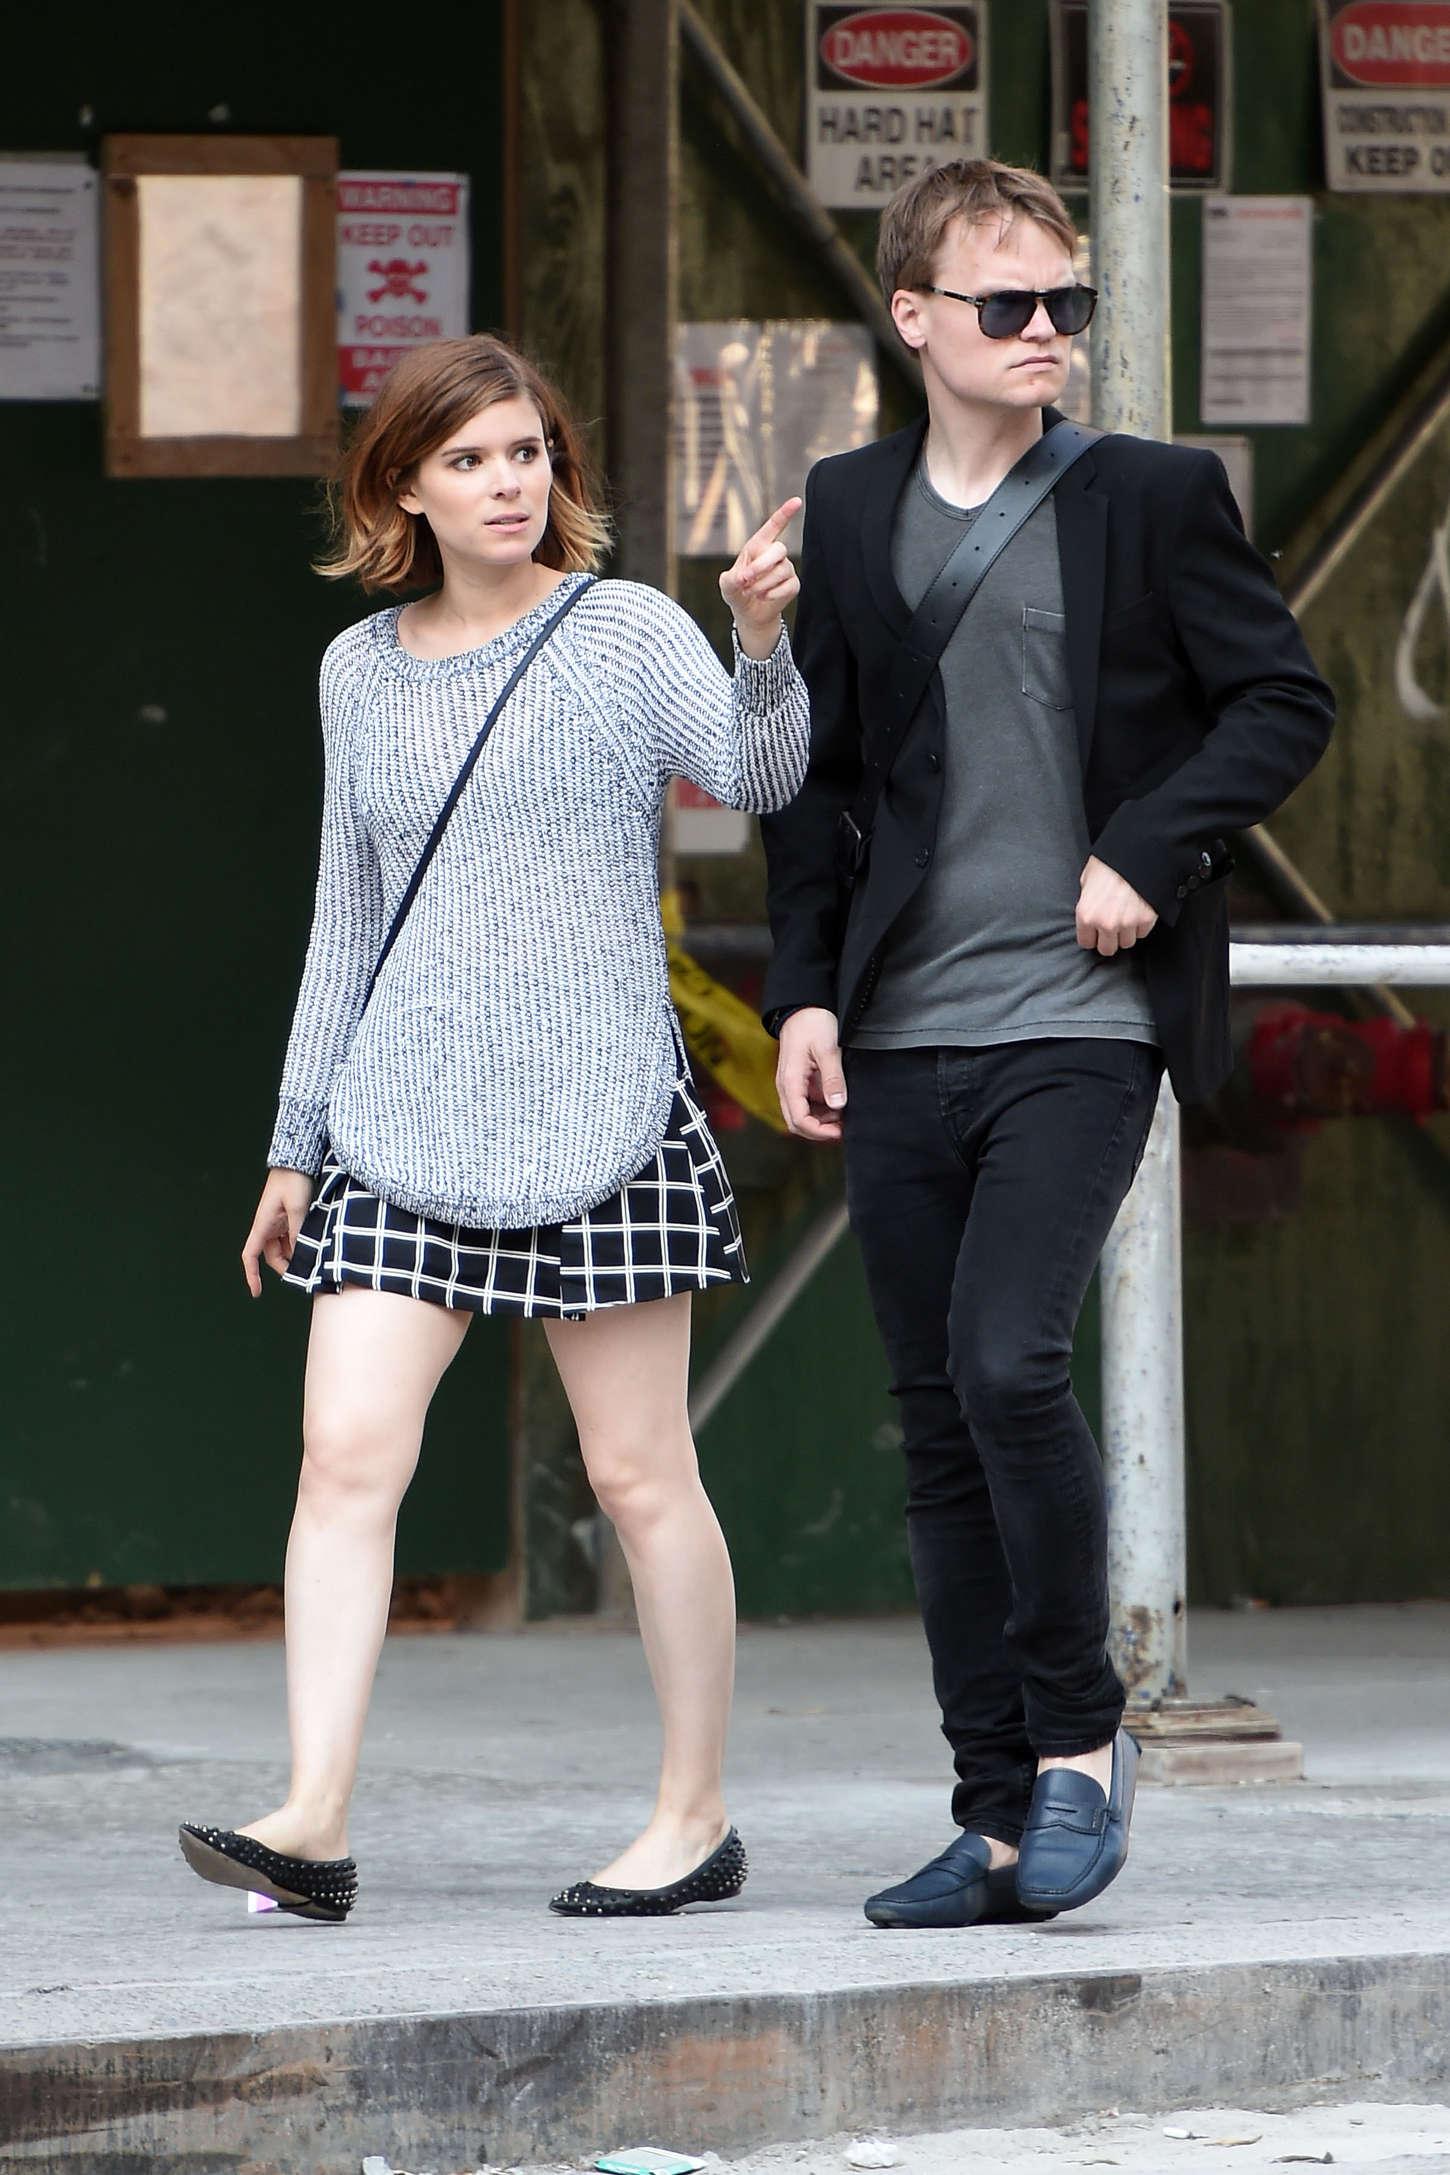 Kate Mara in Mini Skirt Out in NYC